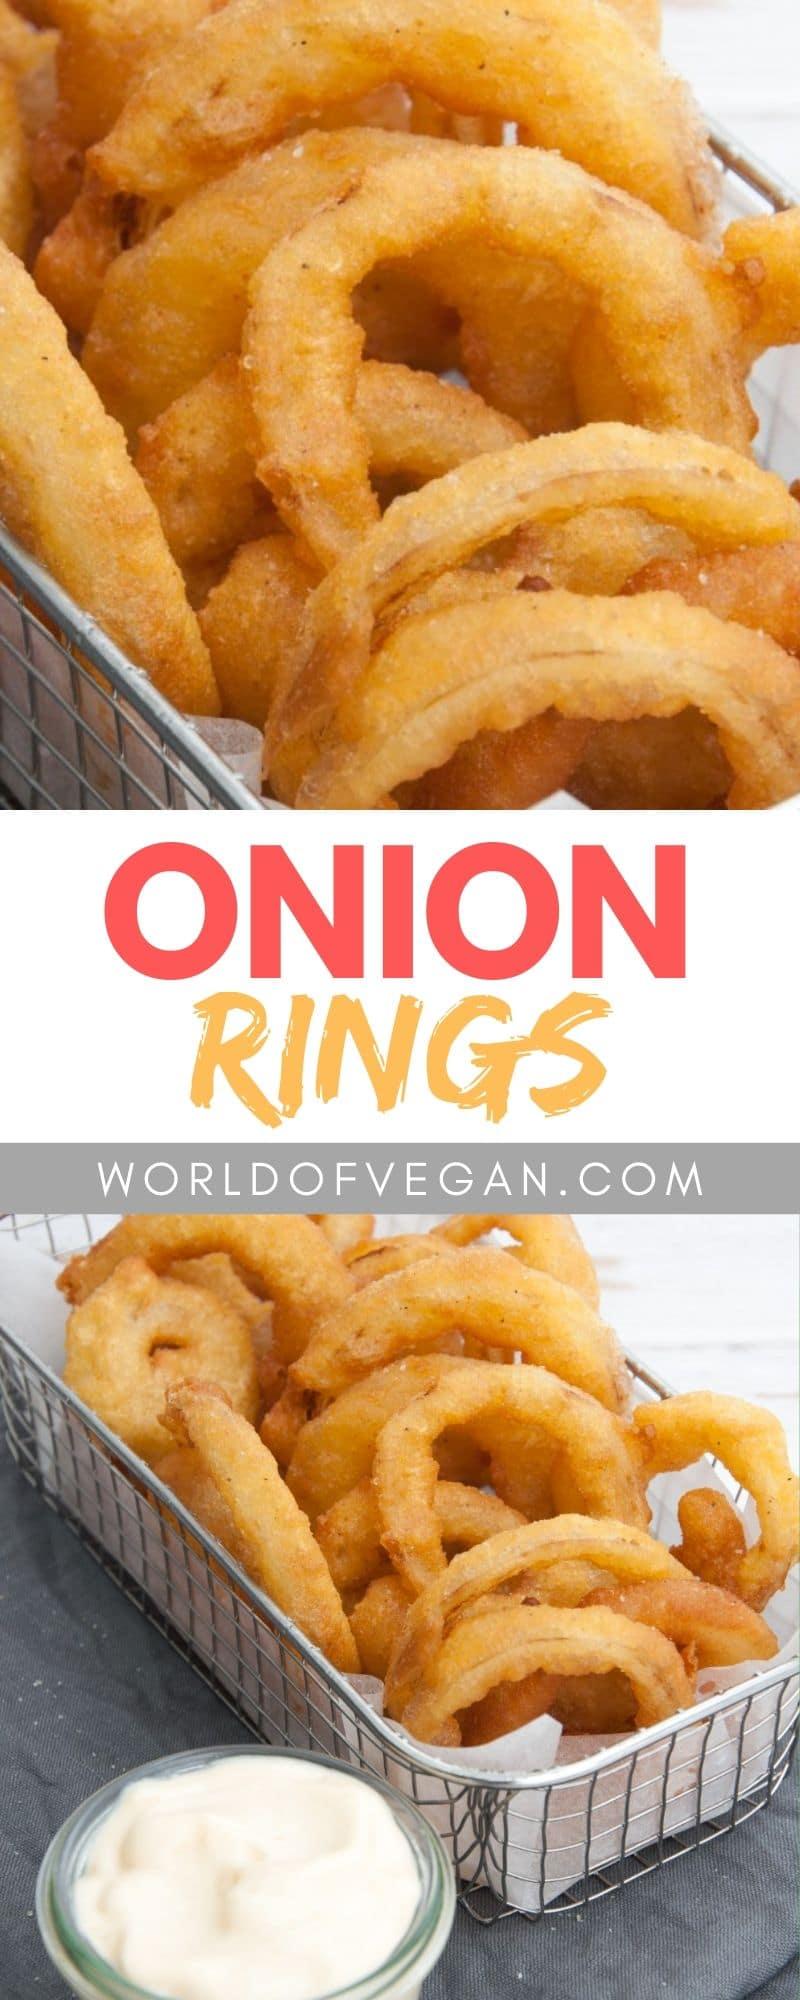 Onion Rings | Vegan Cravings | WorldofVegan.com | #vegan #appetizer #party #summer #holidays #worldofvegan